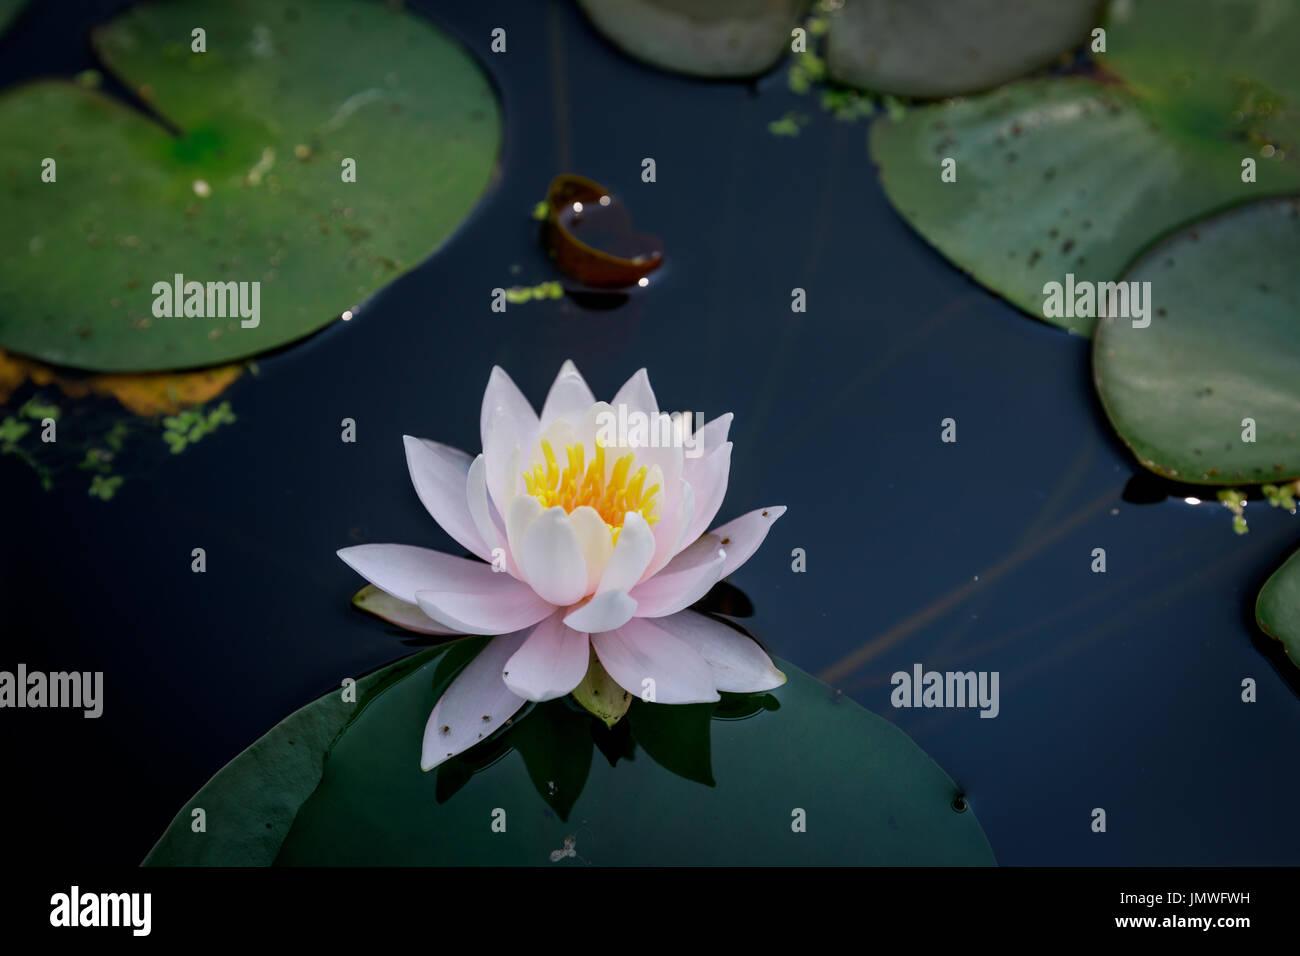 Beautiful lotus flower in pond at summer season stock photo beautiful lotus flower in pond at summer season izmirmasajfo